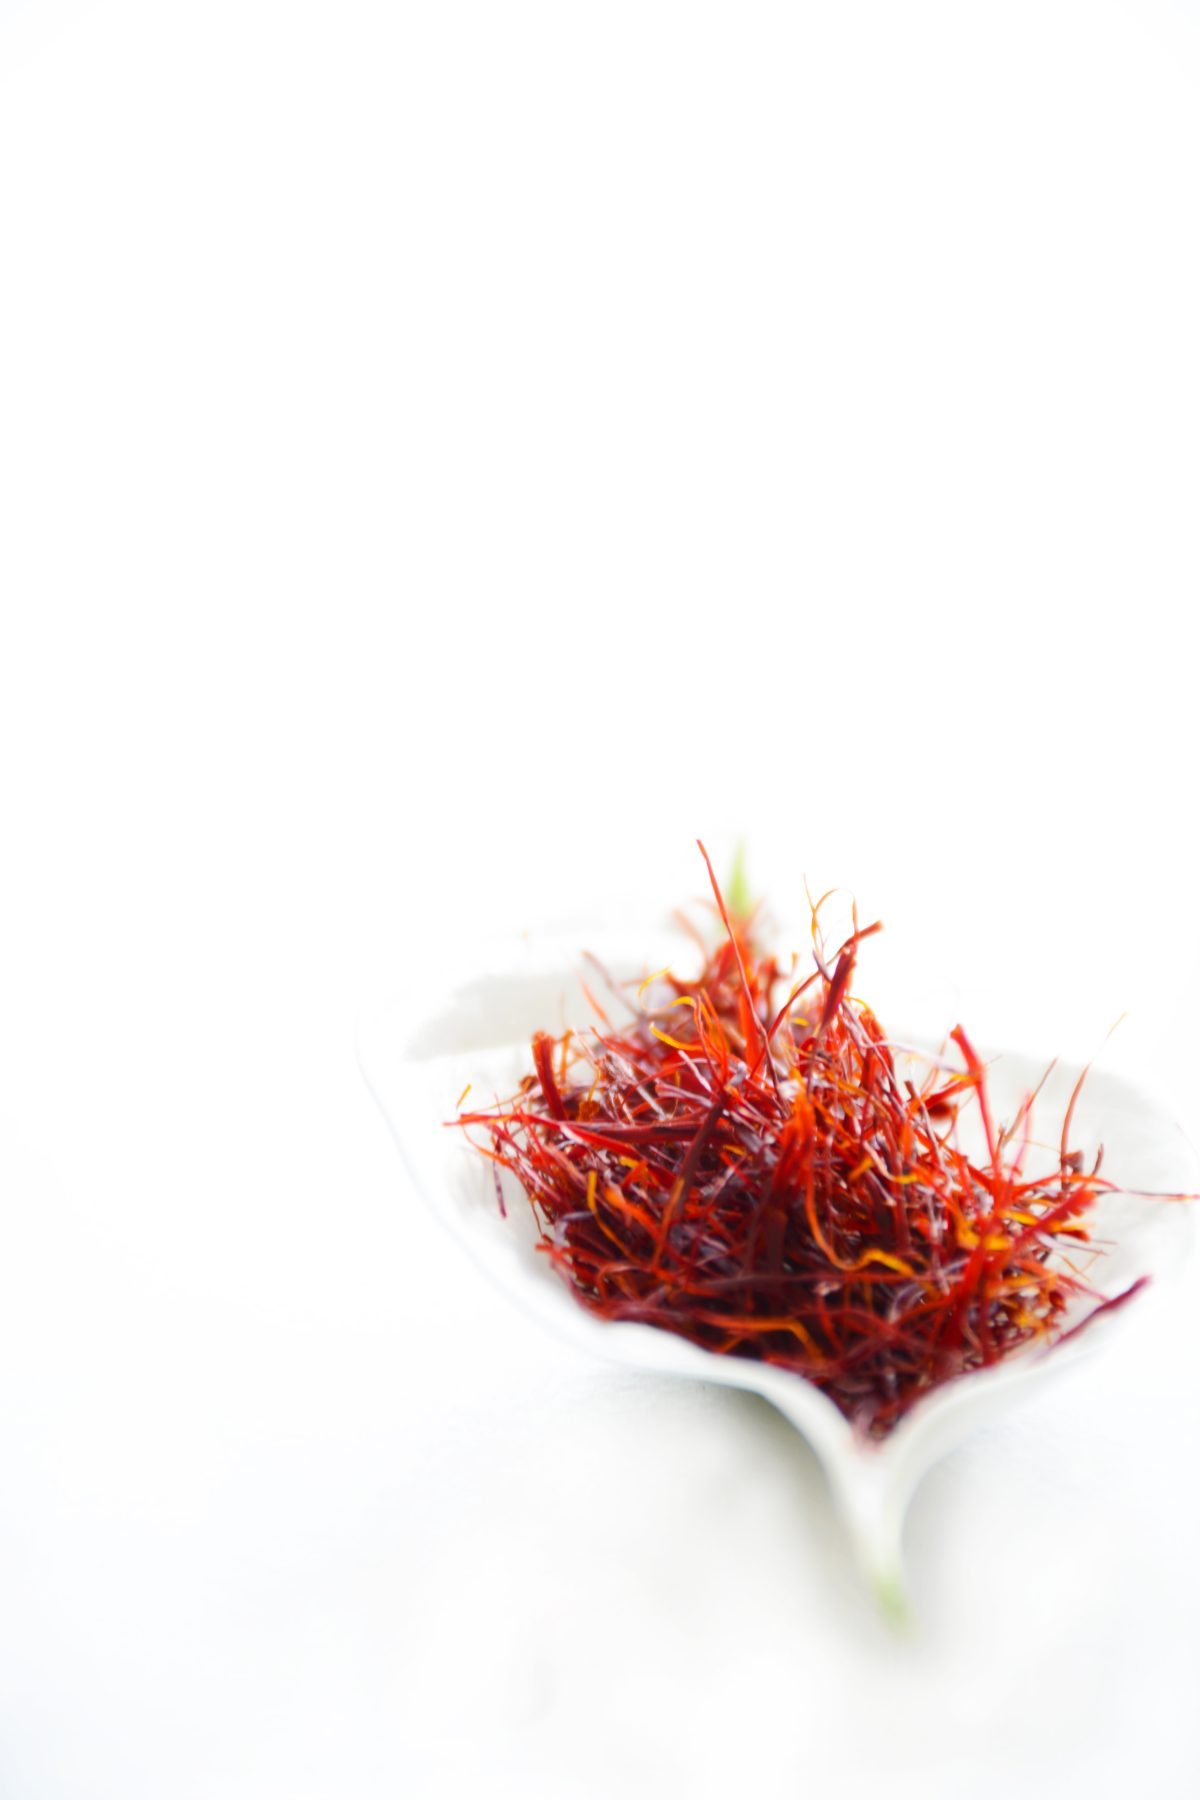 Saffron - food photography - thespiceadventuress.com